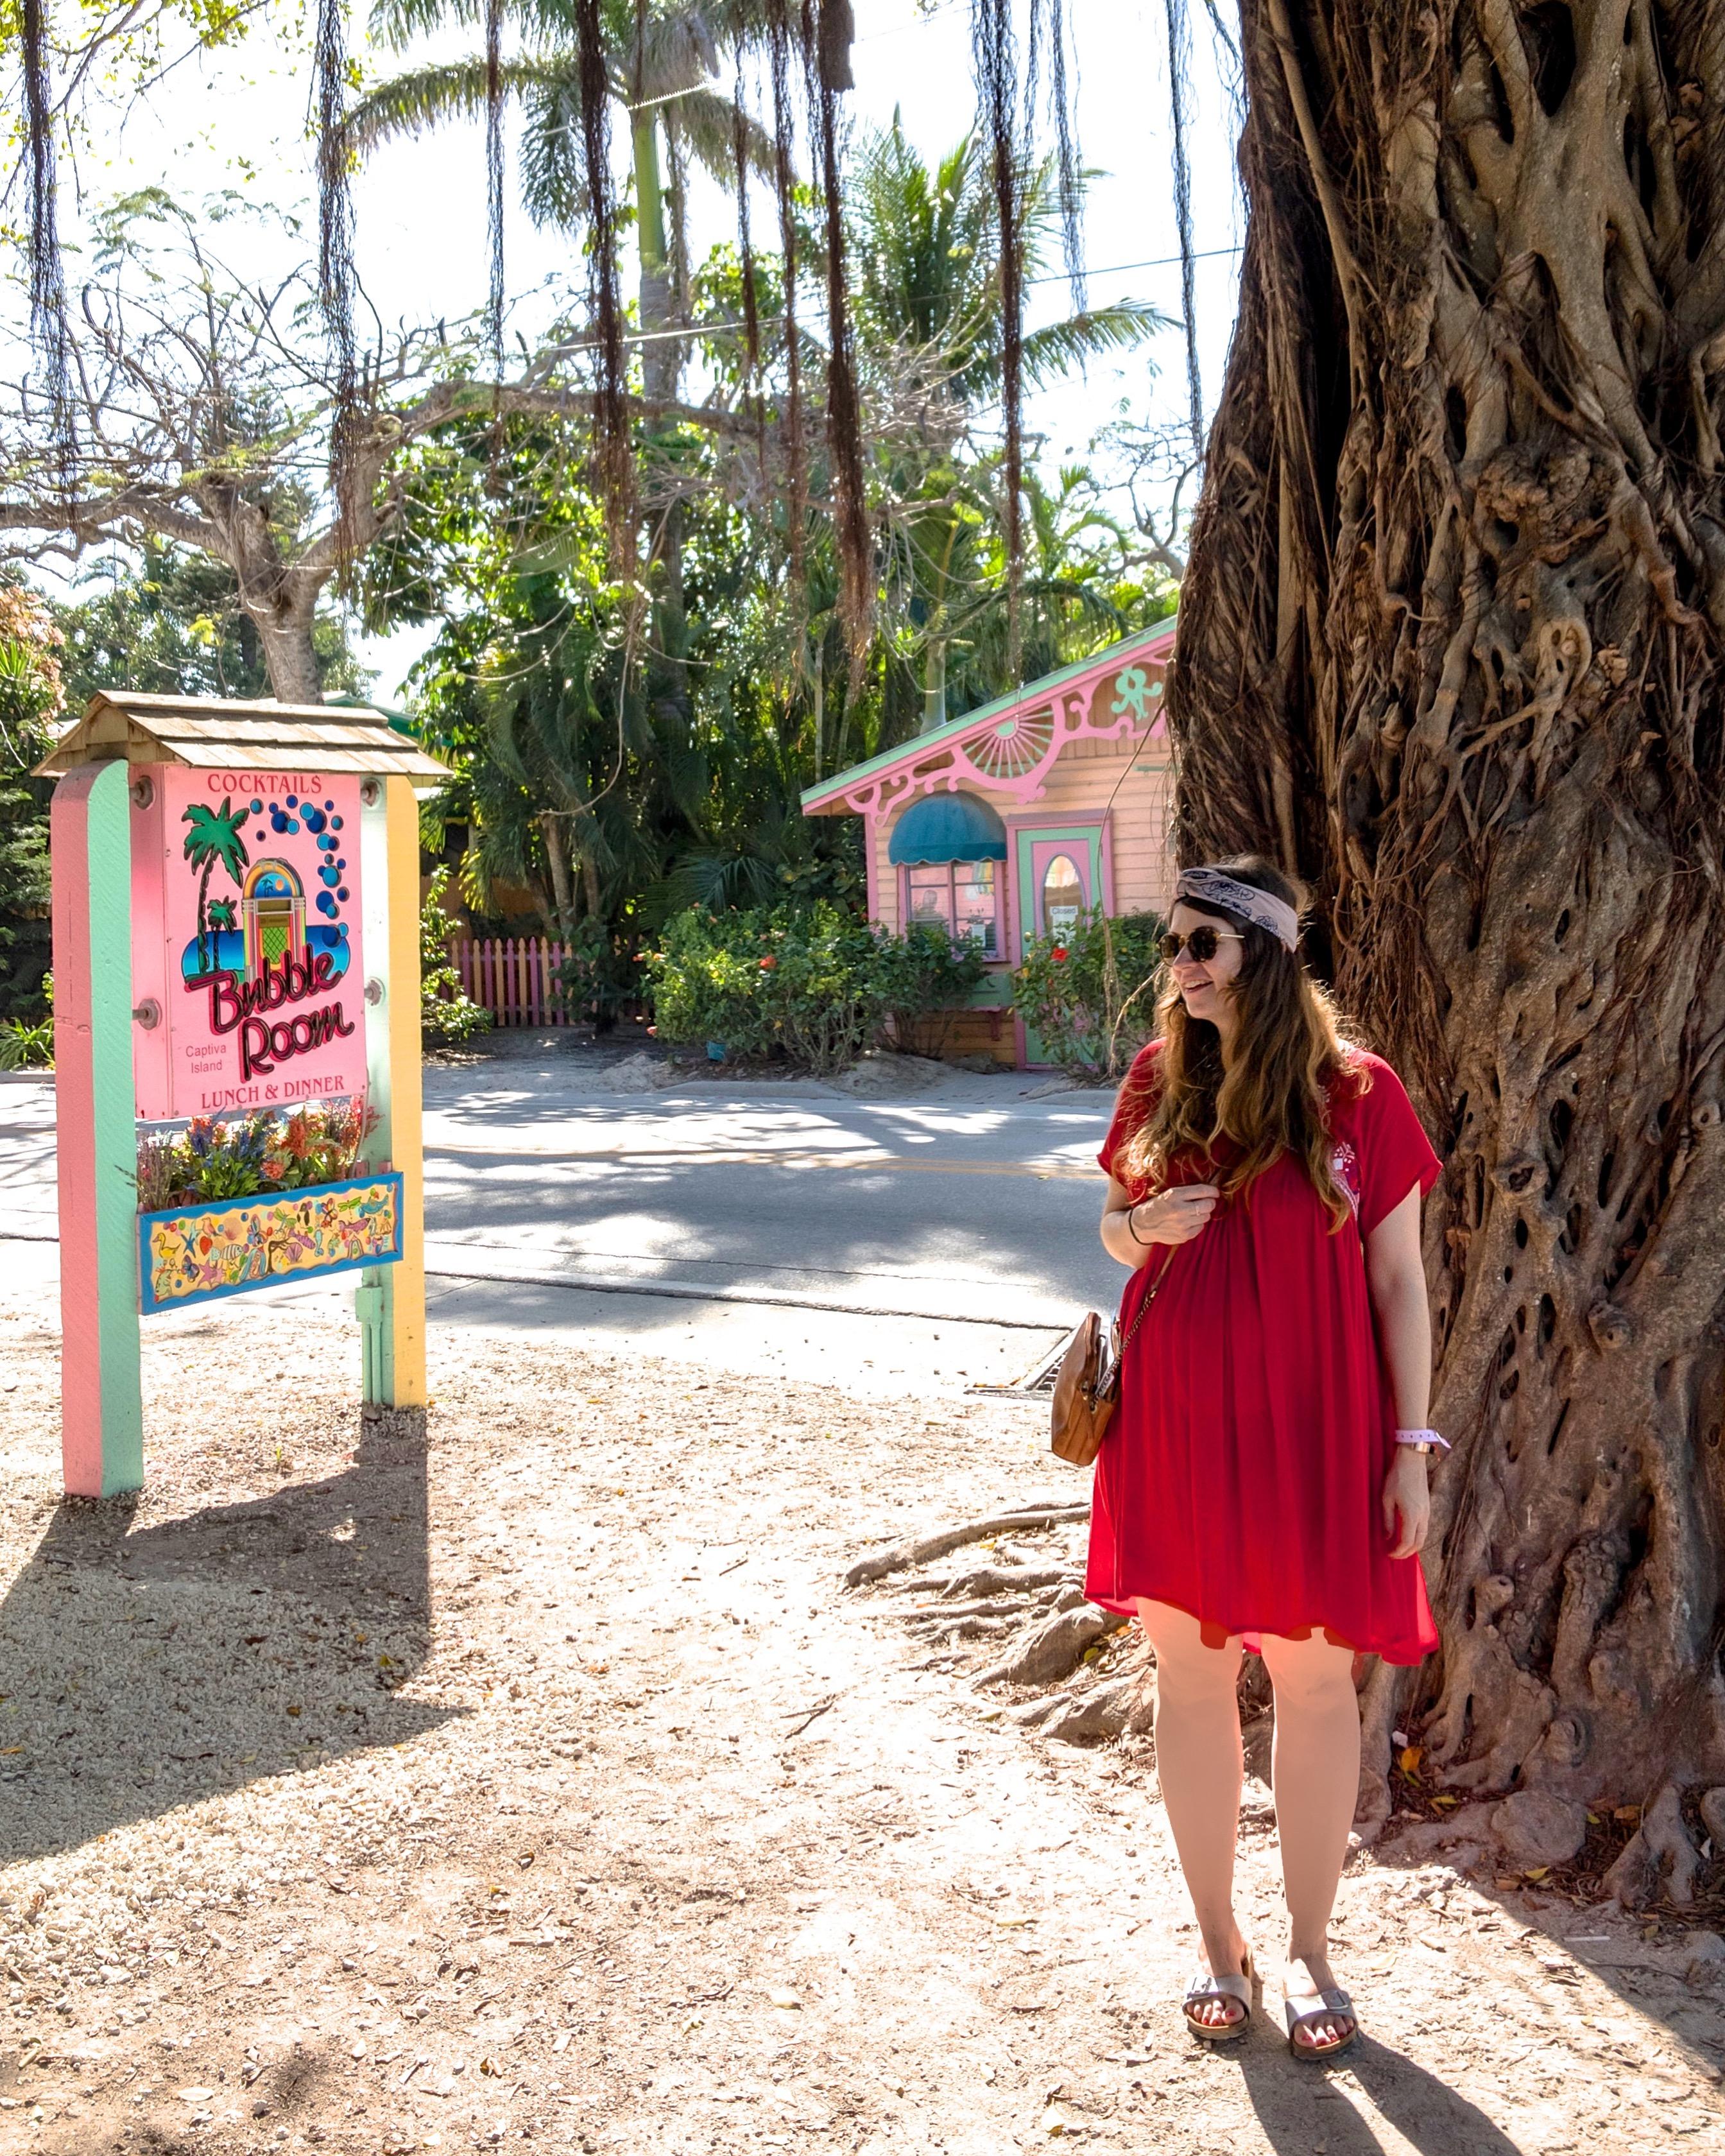 Schwanger im Urlaub - PinkepankStyle Florida Edition mit Mara Mea